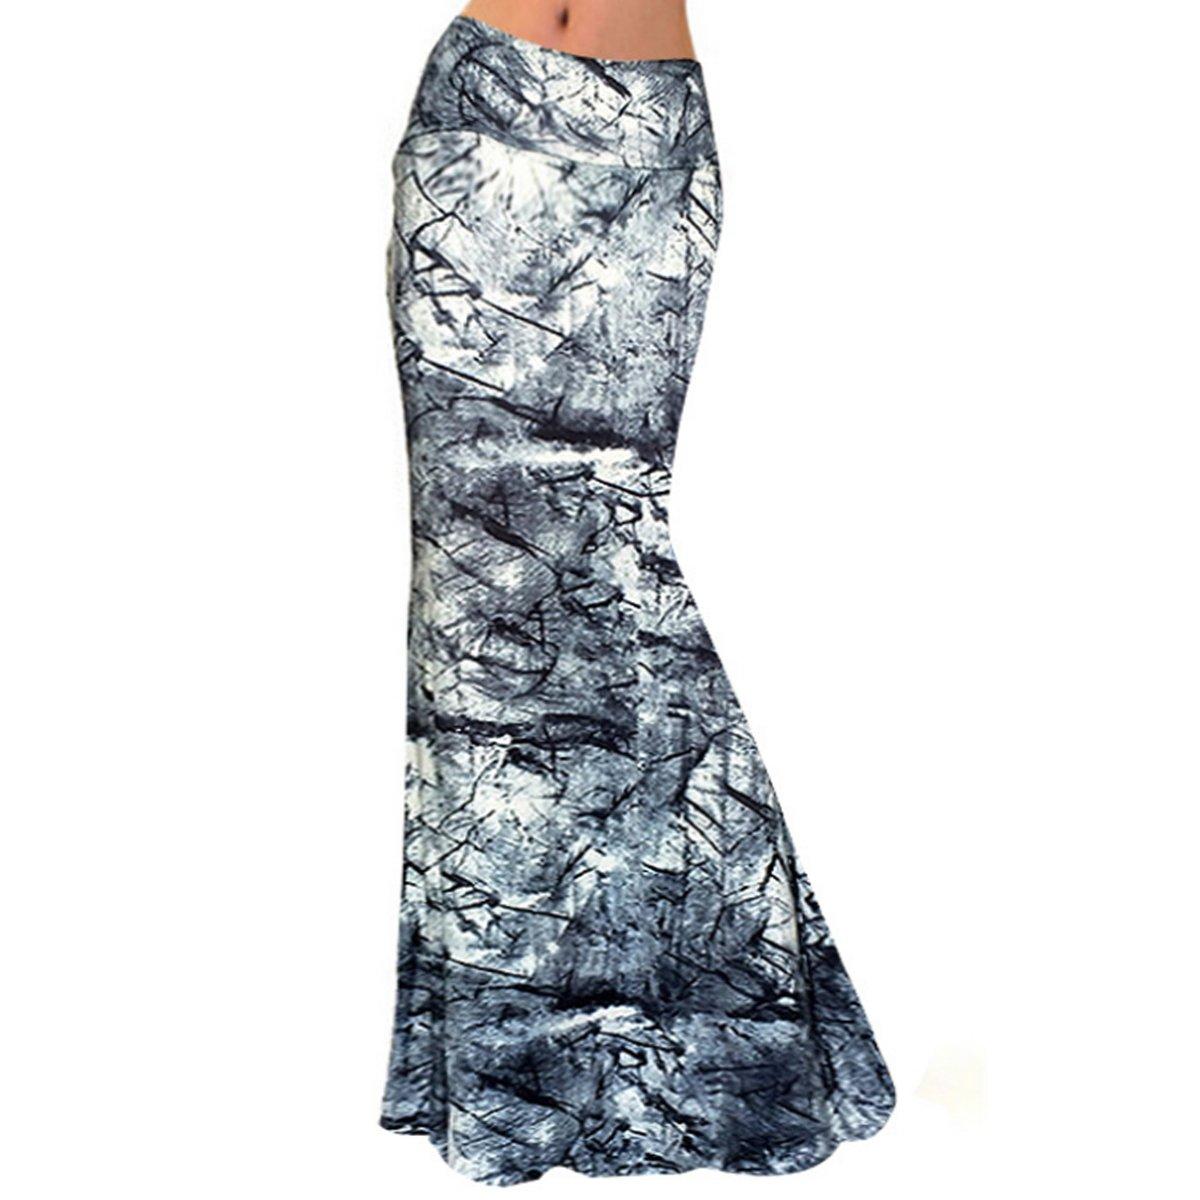 Aisa Womens Multicolored Printed High Waist Maxi Skirt New Fold Over Beach Long Skirt Dress Size Large